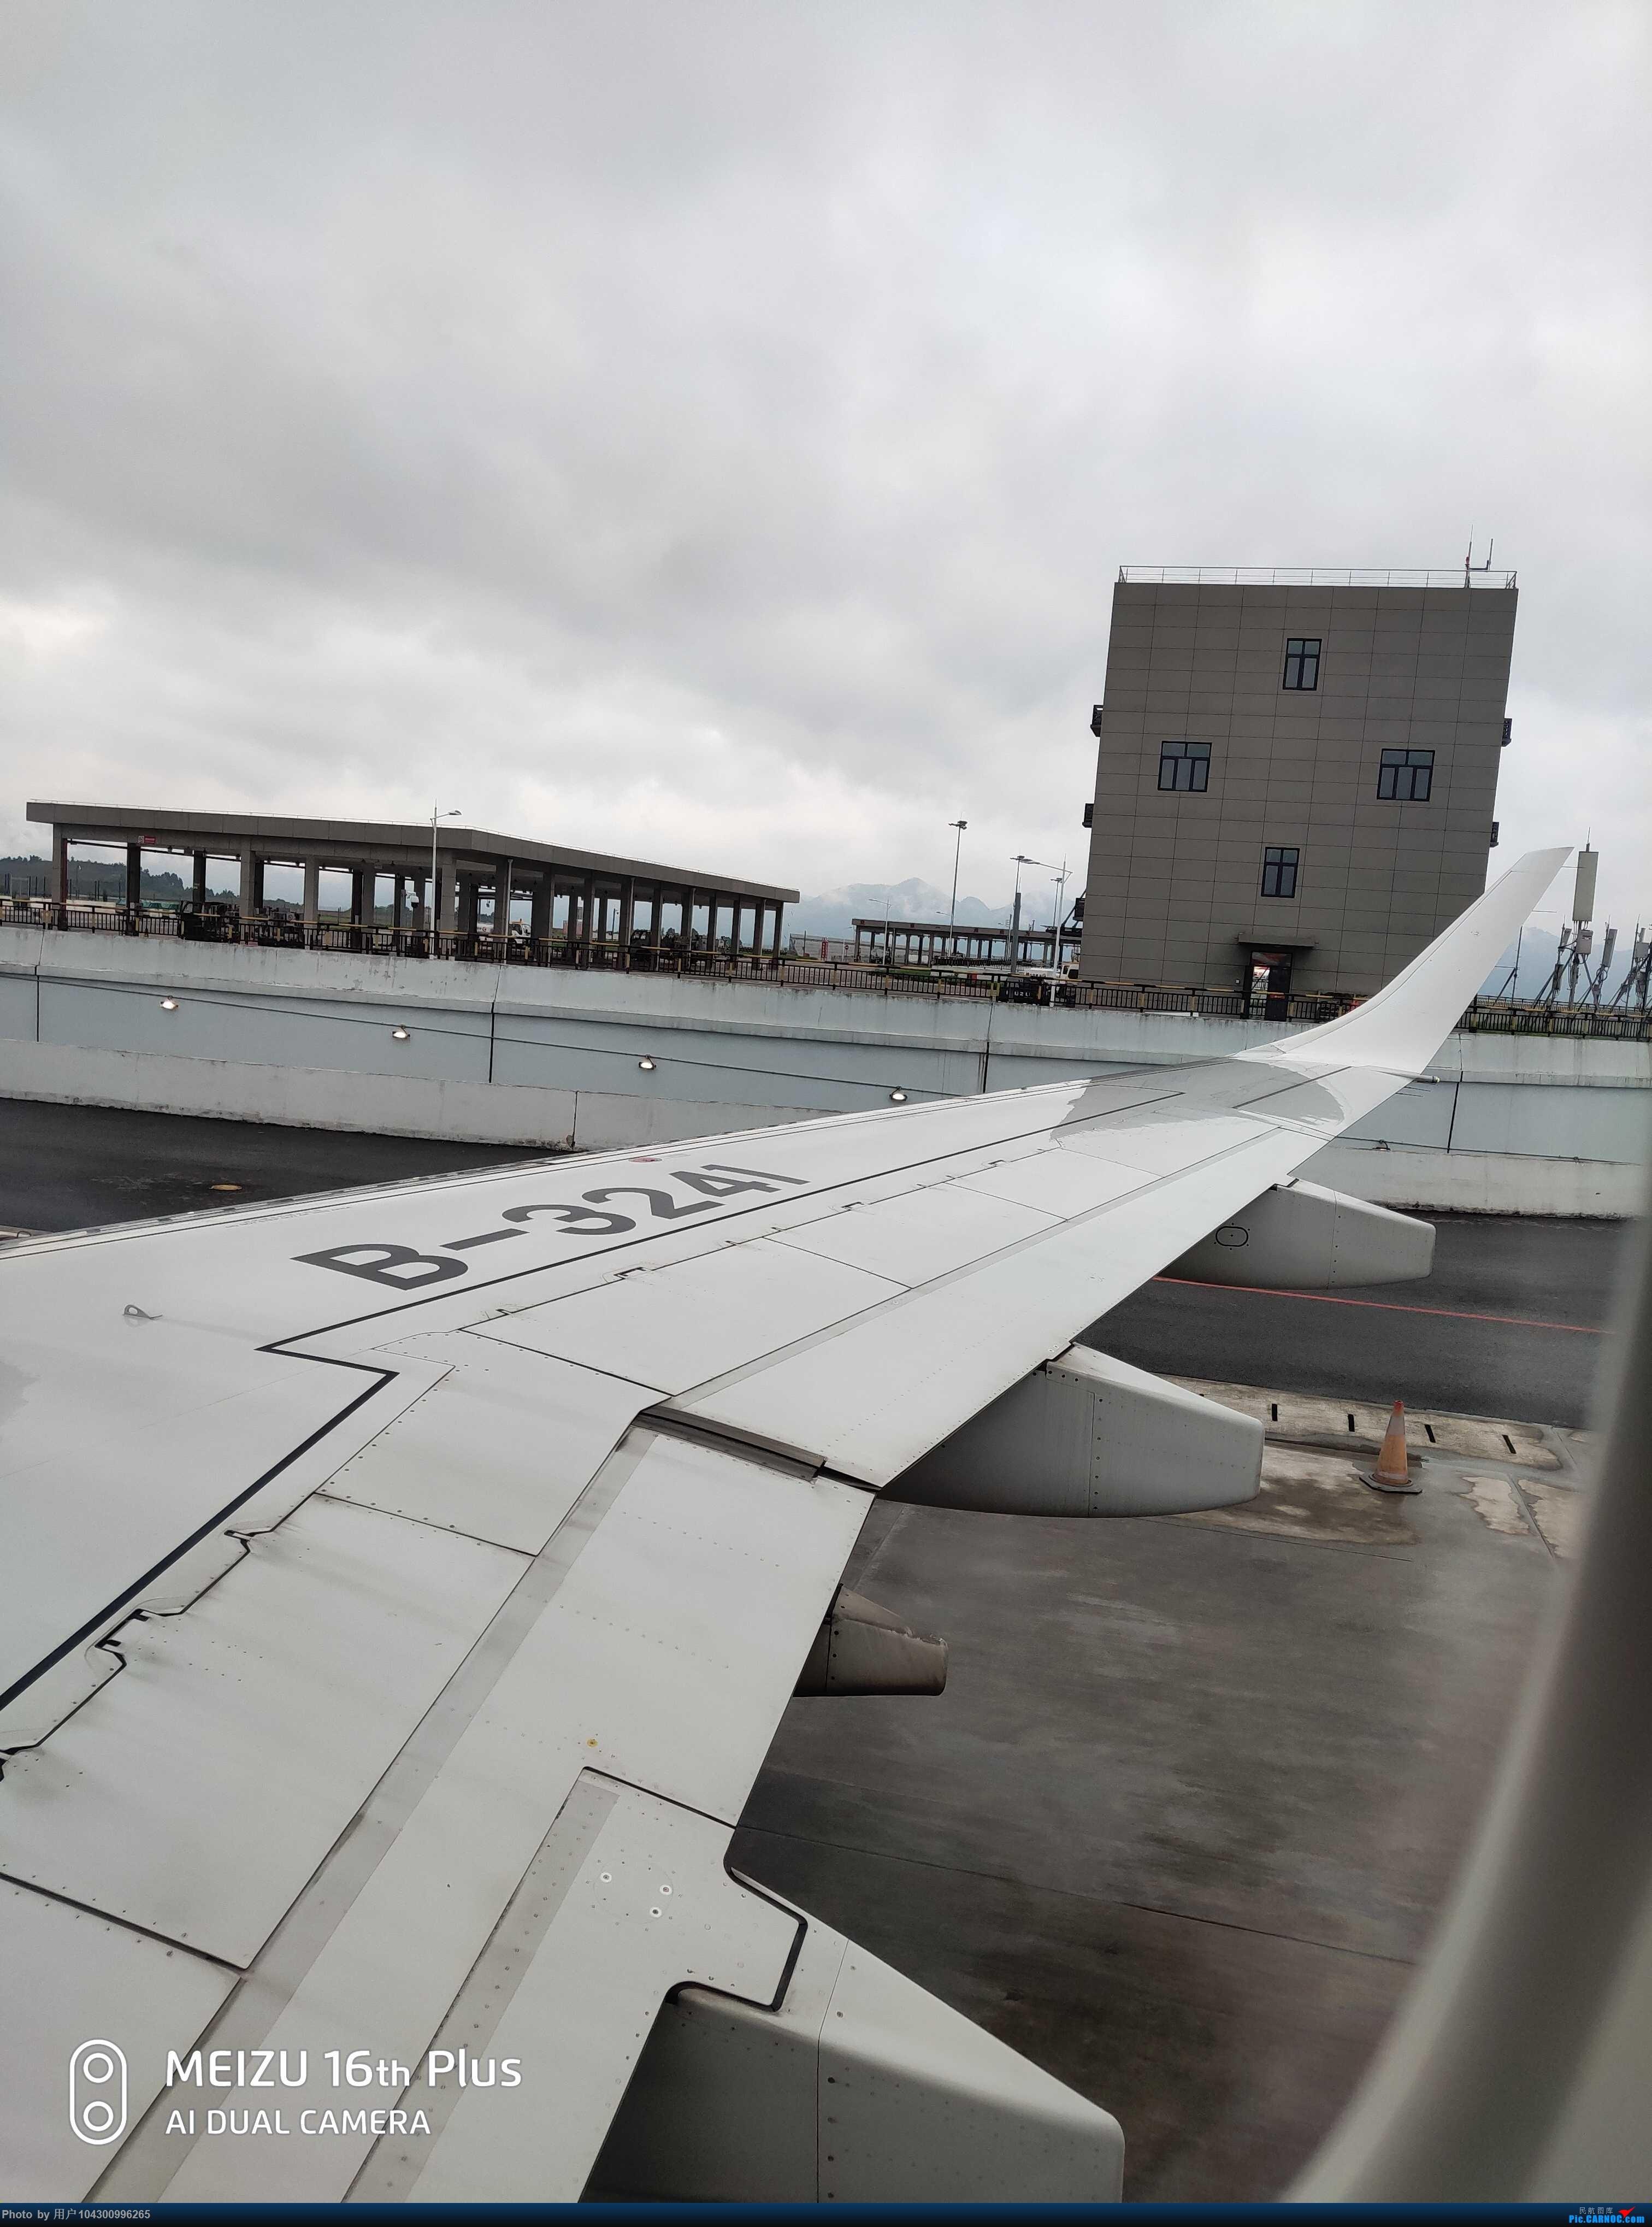 Re:[原创]〖DM哥游记〗多彩贵州航空~重庆--贵阳 EMBRAER E-190 B-3241 中国重庆江北国际机场